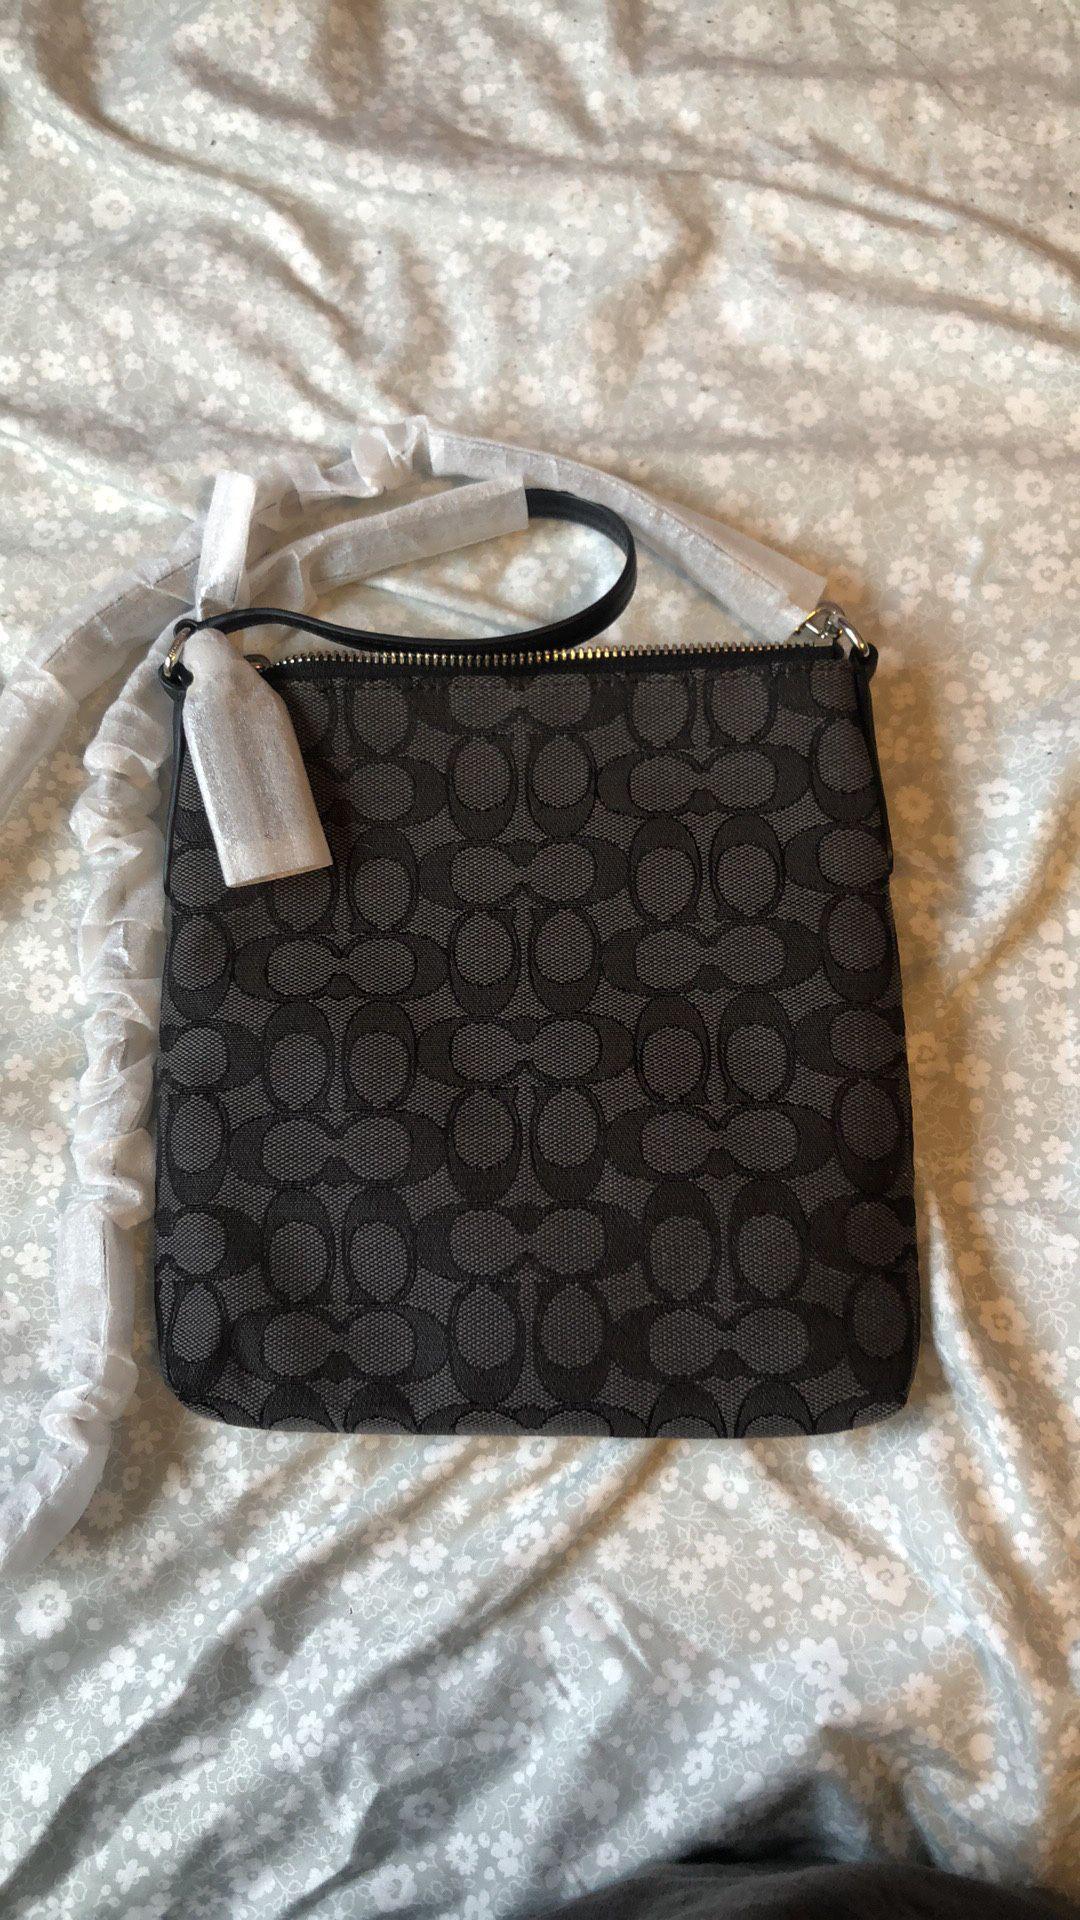 brand new coach crossbody bag